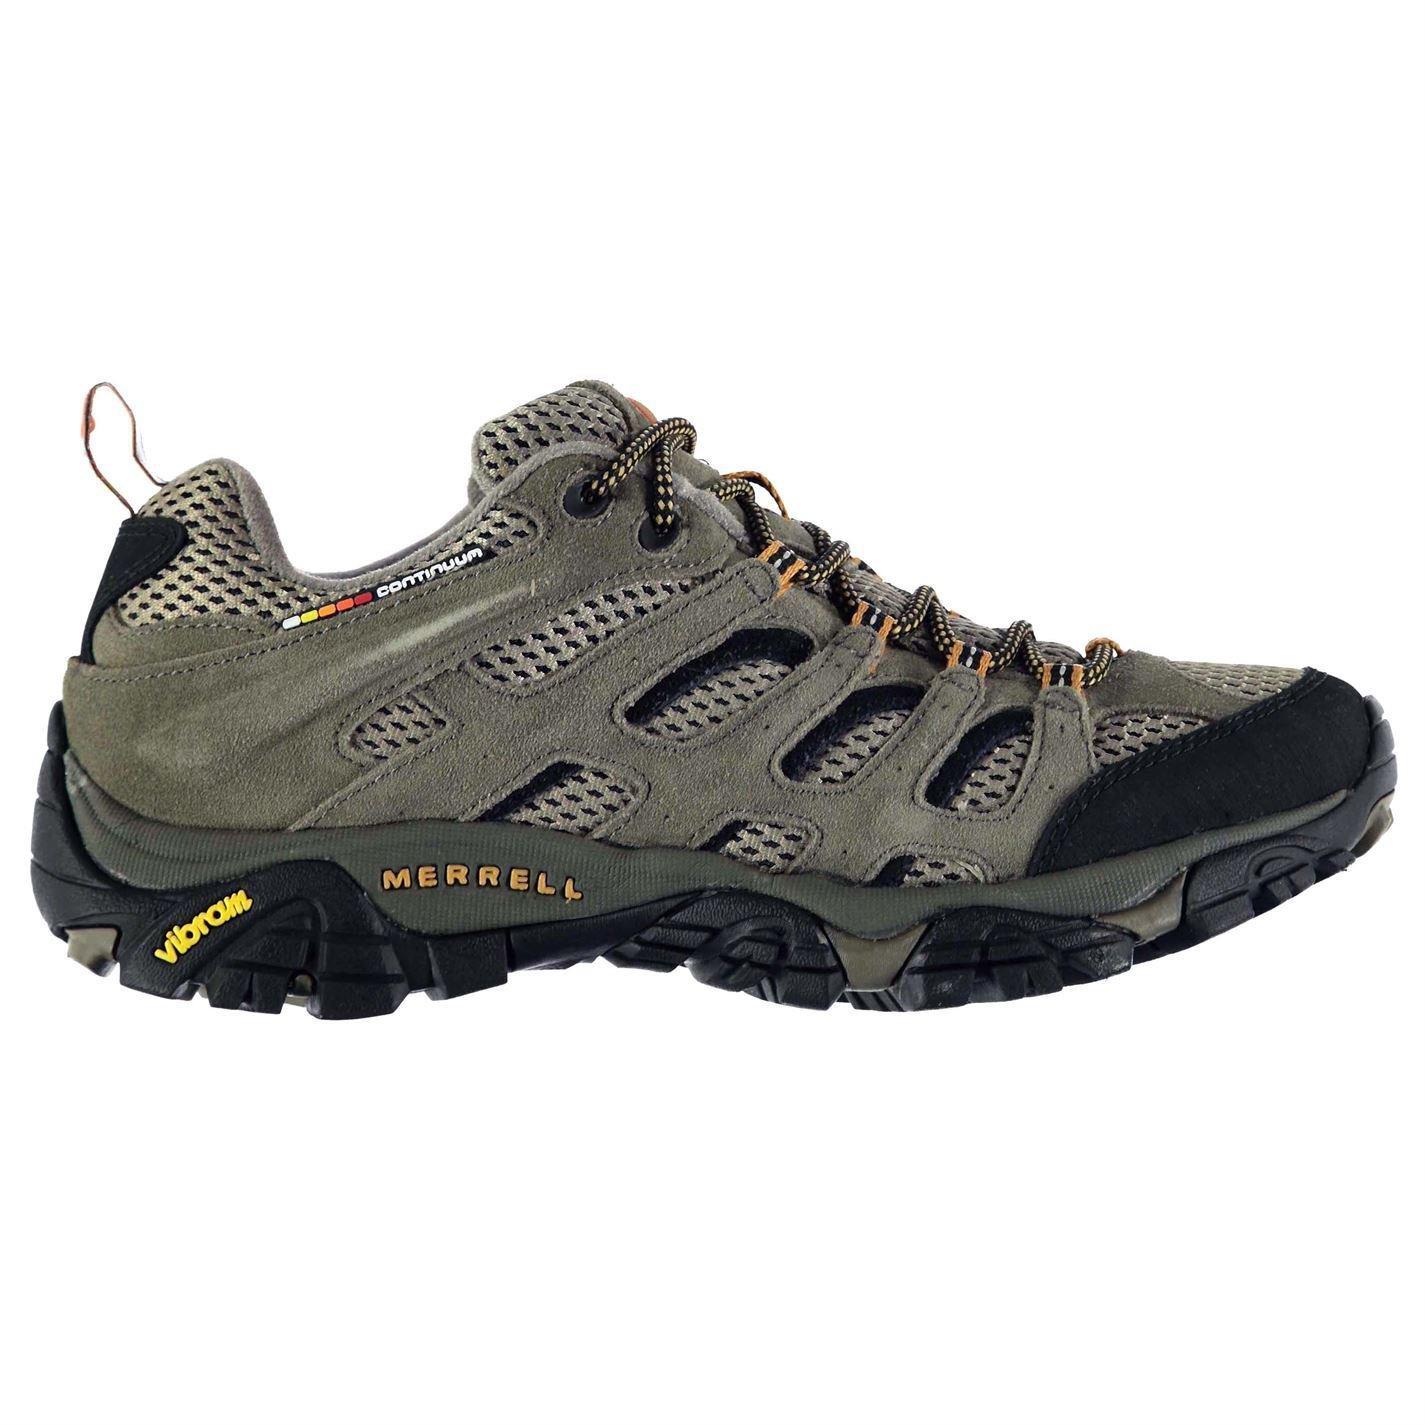 Merrell Mens Moab Ventilator Lace Up Walking Breathable Design Shoes